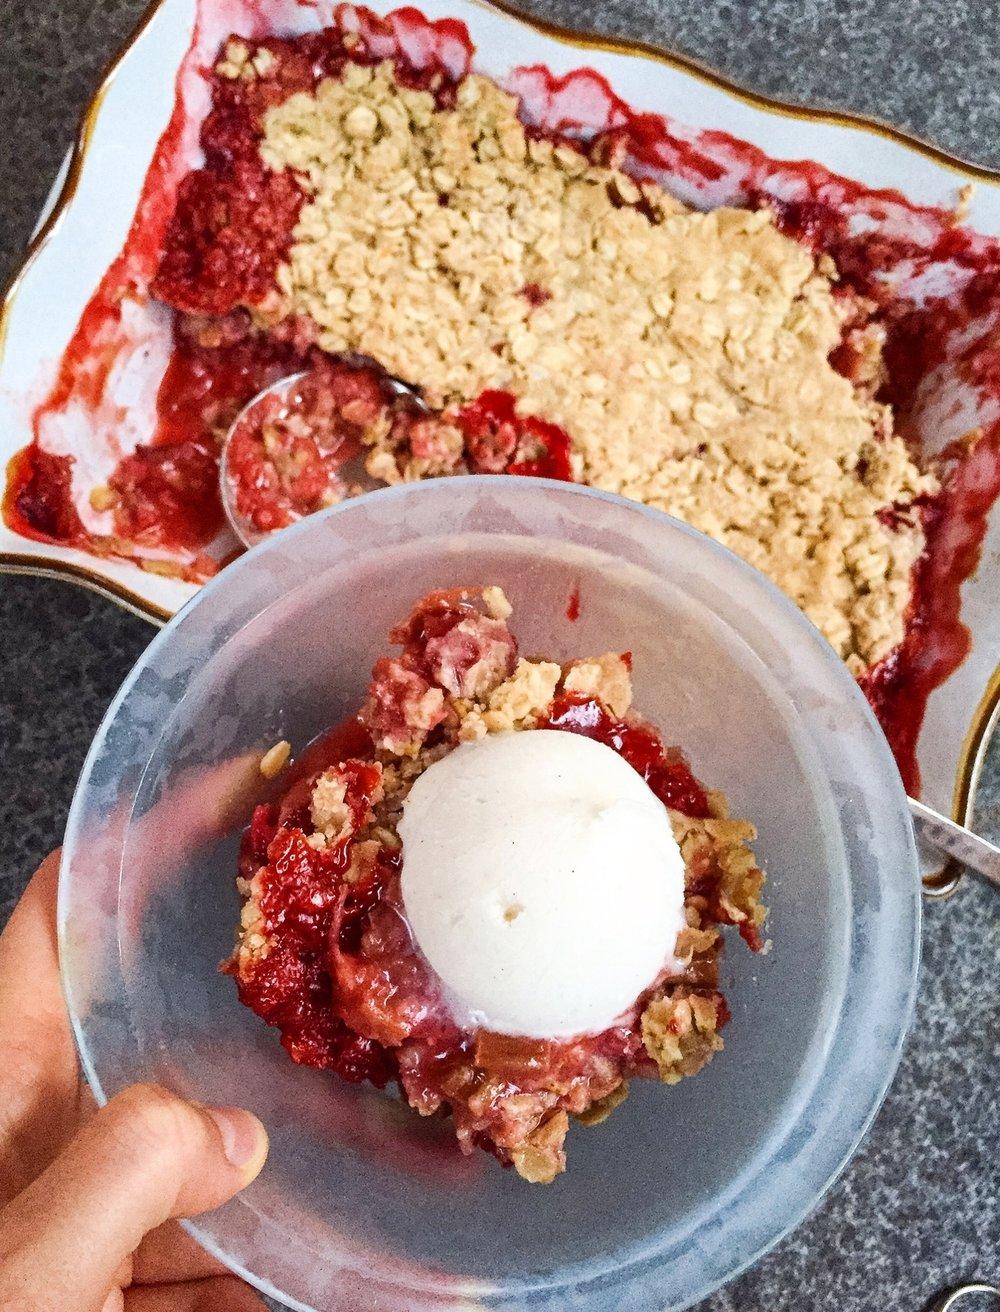 Ontario Strawberry & Rhubarb Crisp